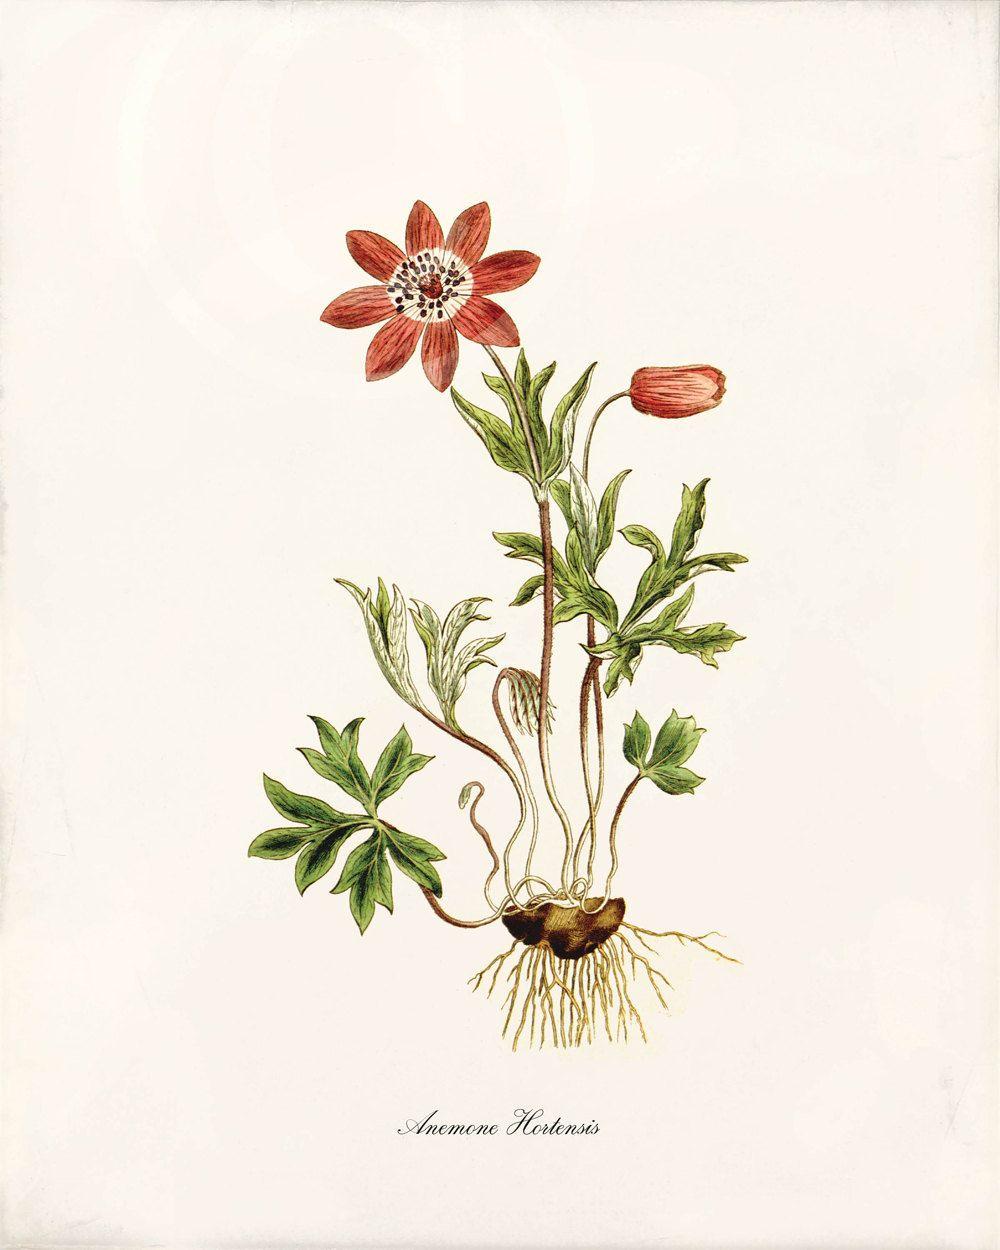 Antique botanical art print 8x10 anemone botanica laminas